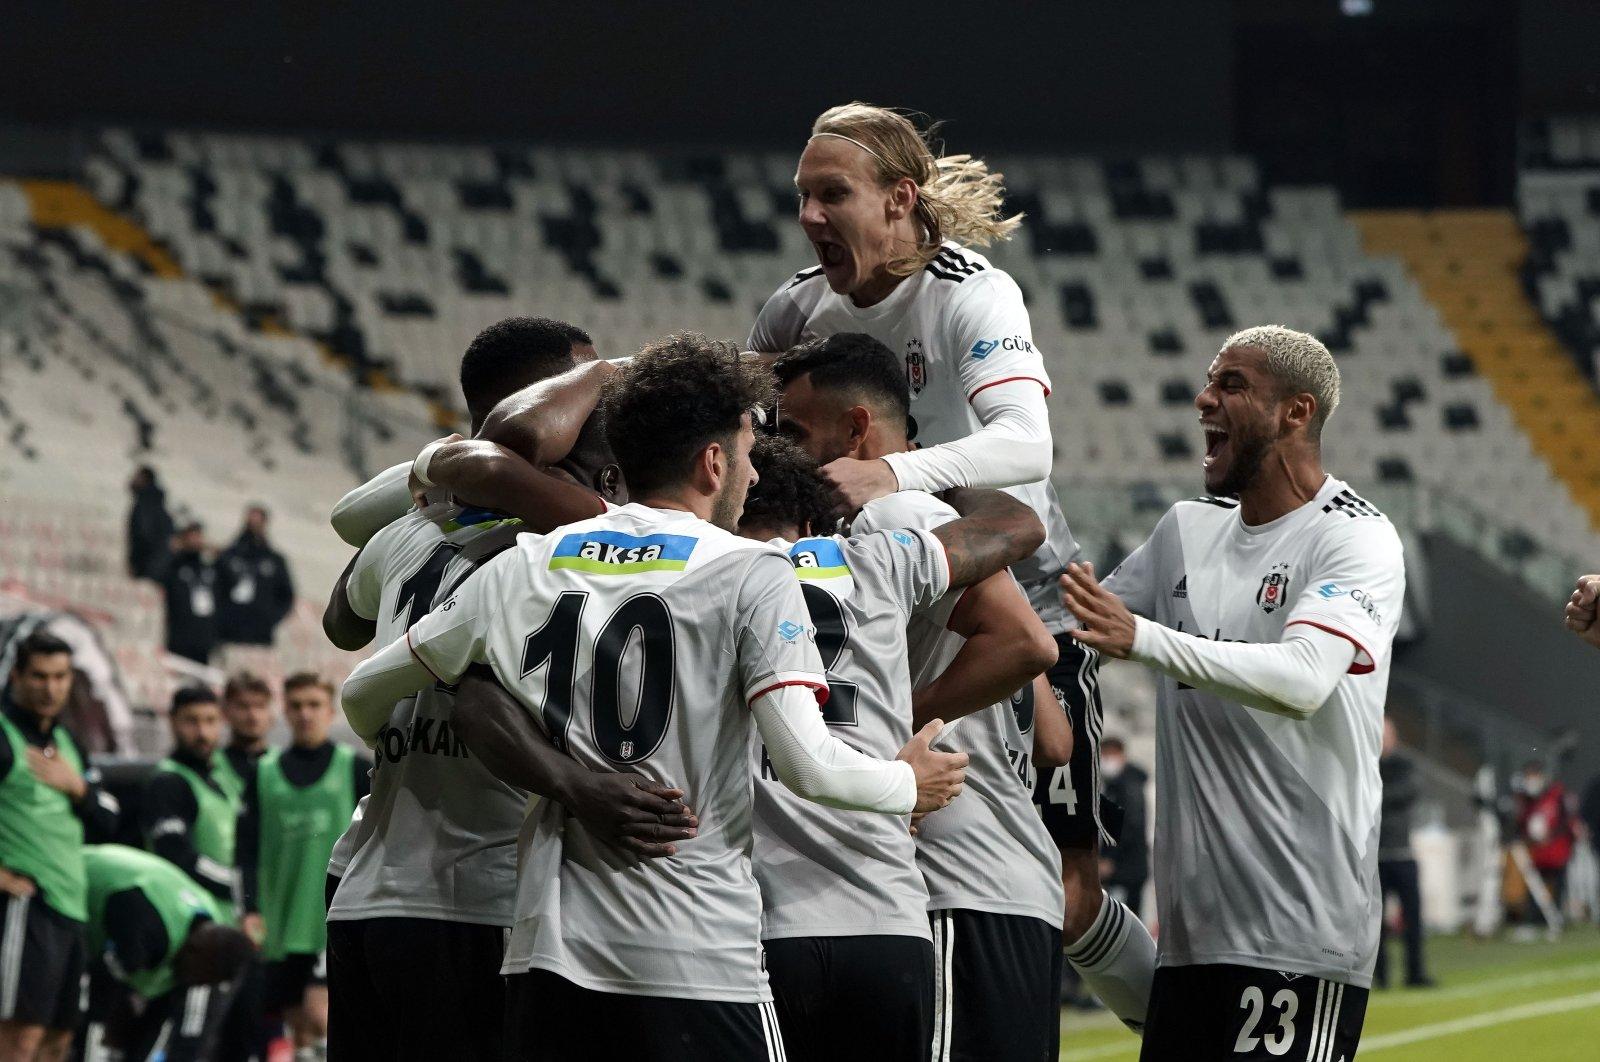 Beşiktaş players celebrate a goal during the Süper Lig match against Yeni Malatyaspor, in Istanbul, Turkey, Nov. 1, 2020. (IHA Photo)